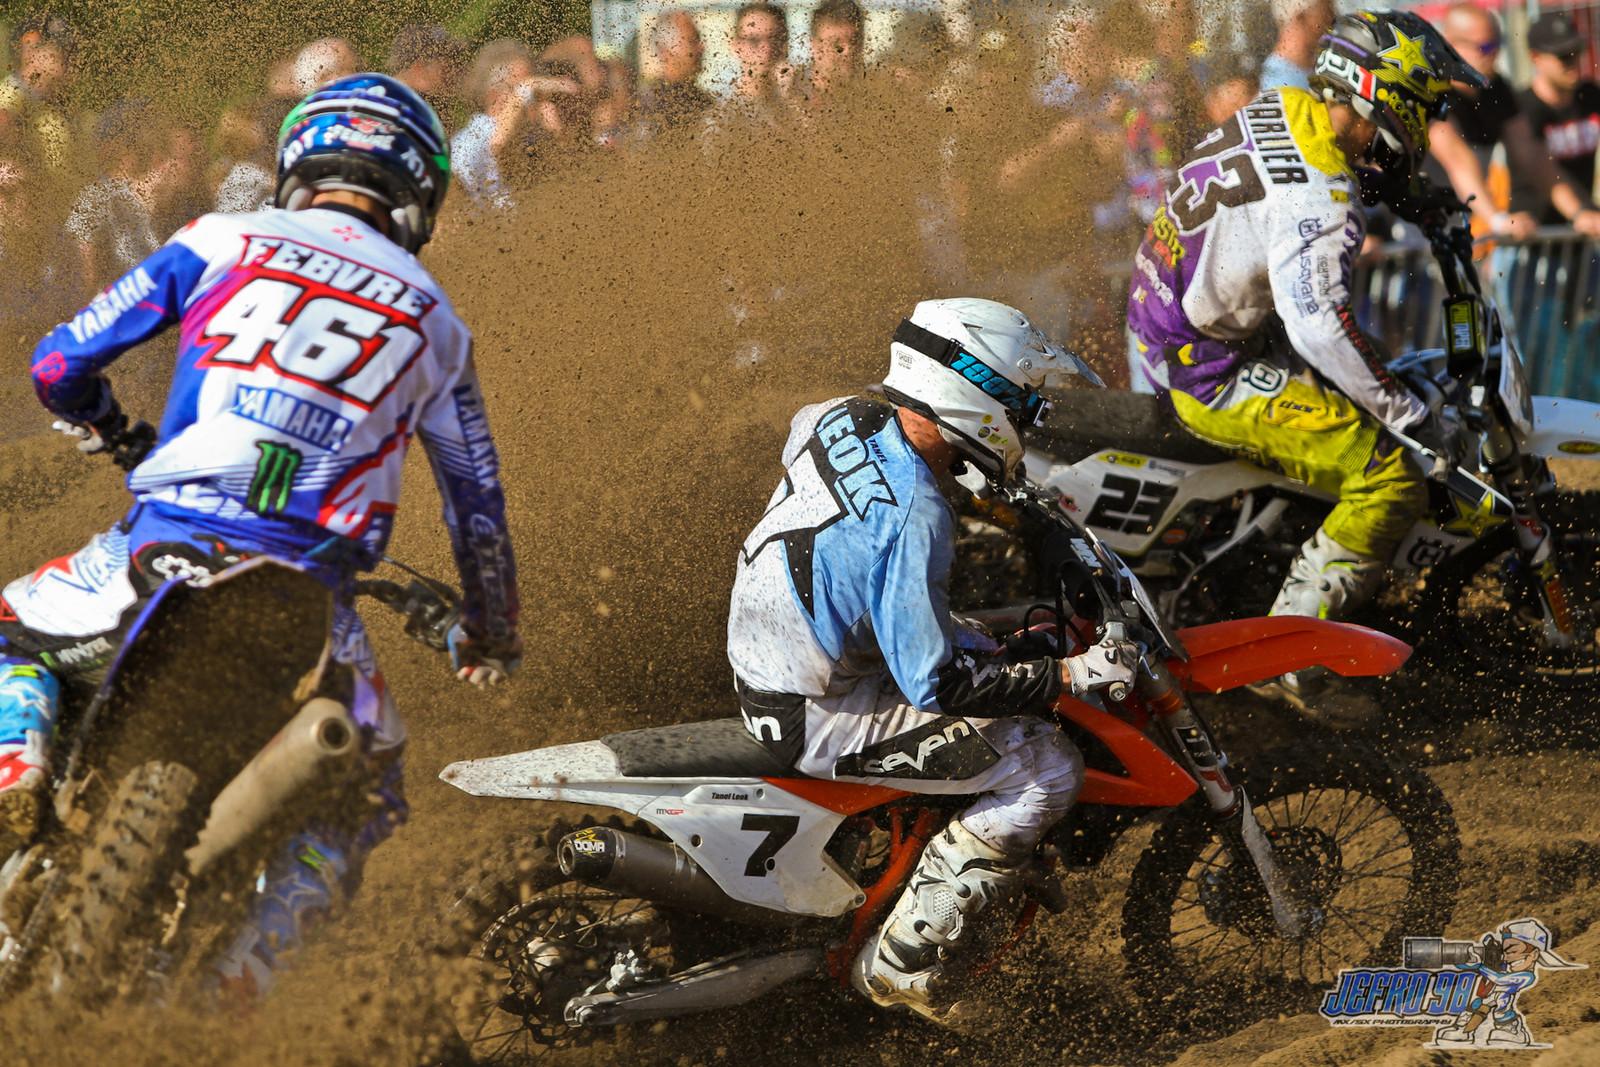 Tanel Leok - Photo Gallery: MXGP of Limburg - Motocross Pictures - Vital MX